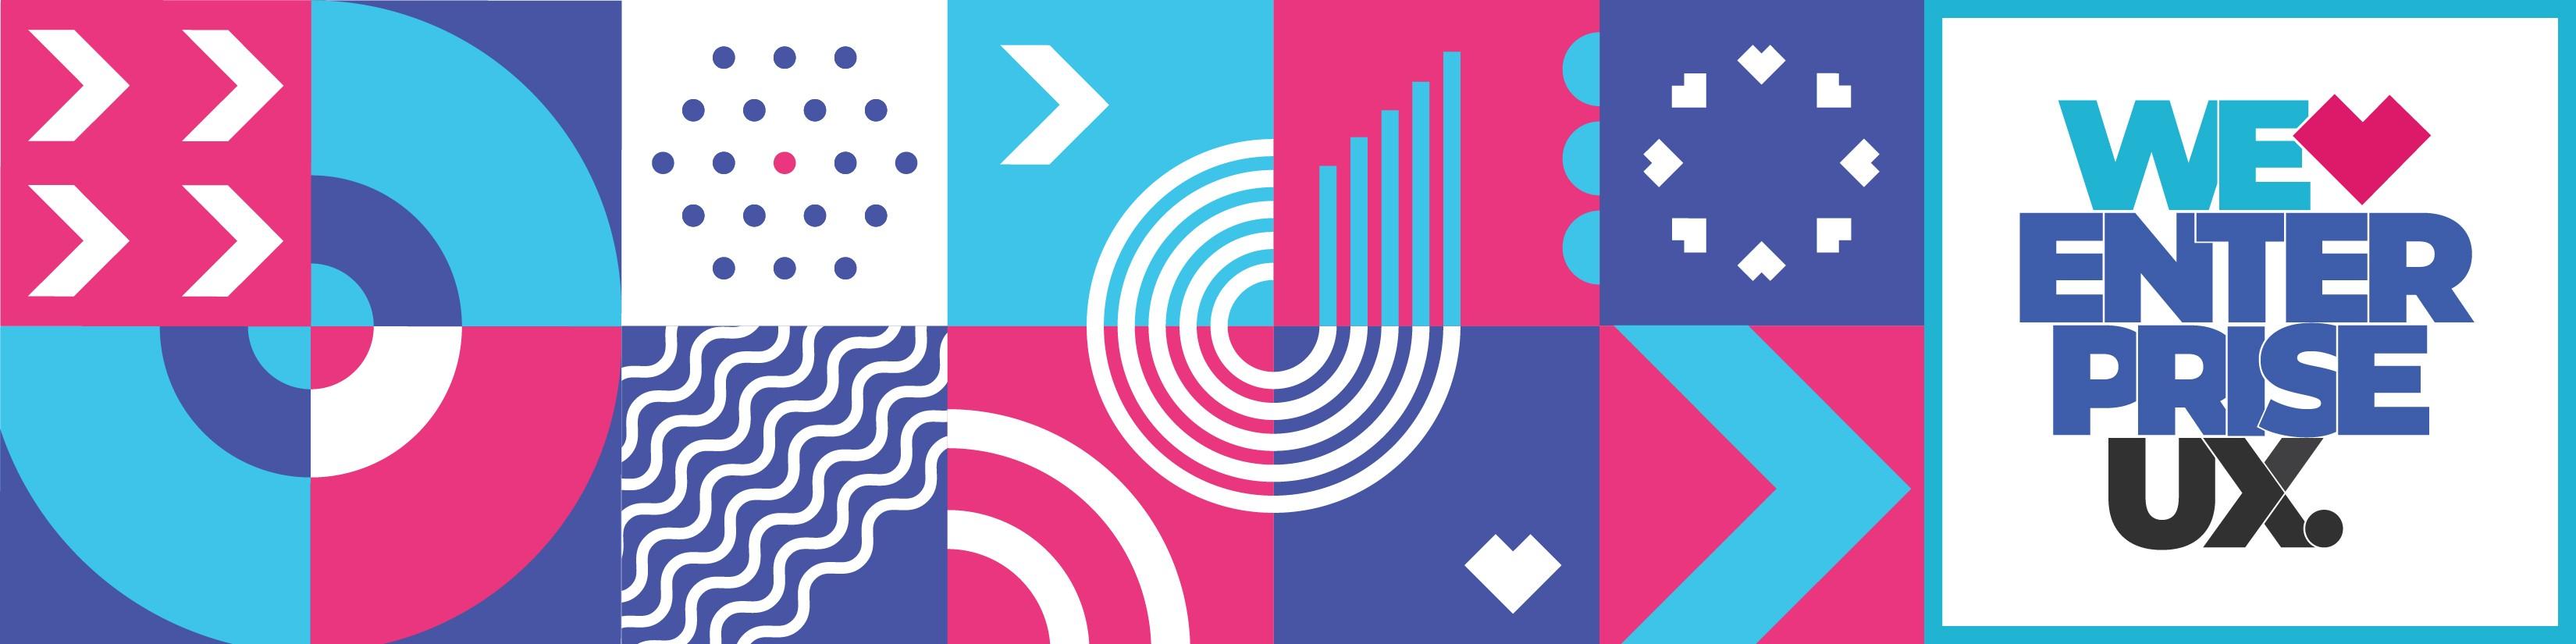 F1studioz Enterprise Ux Ui Design Company Linkedin